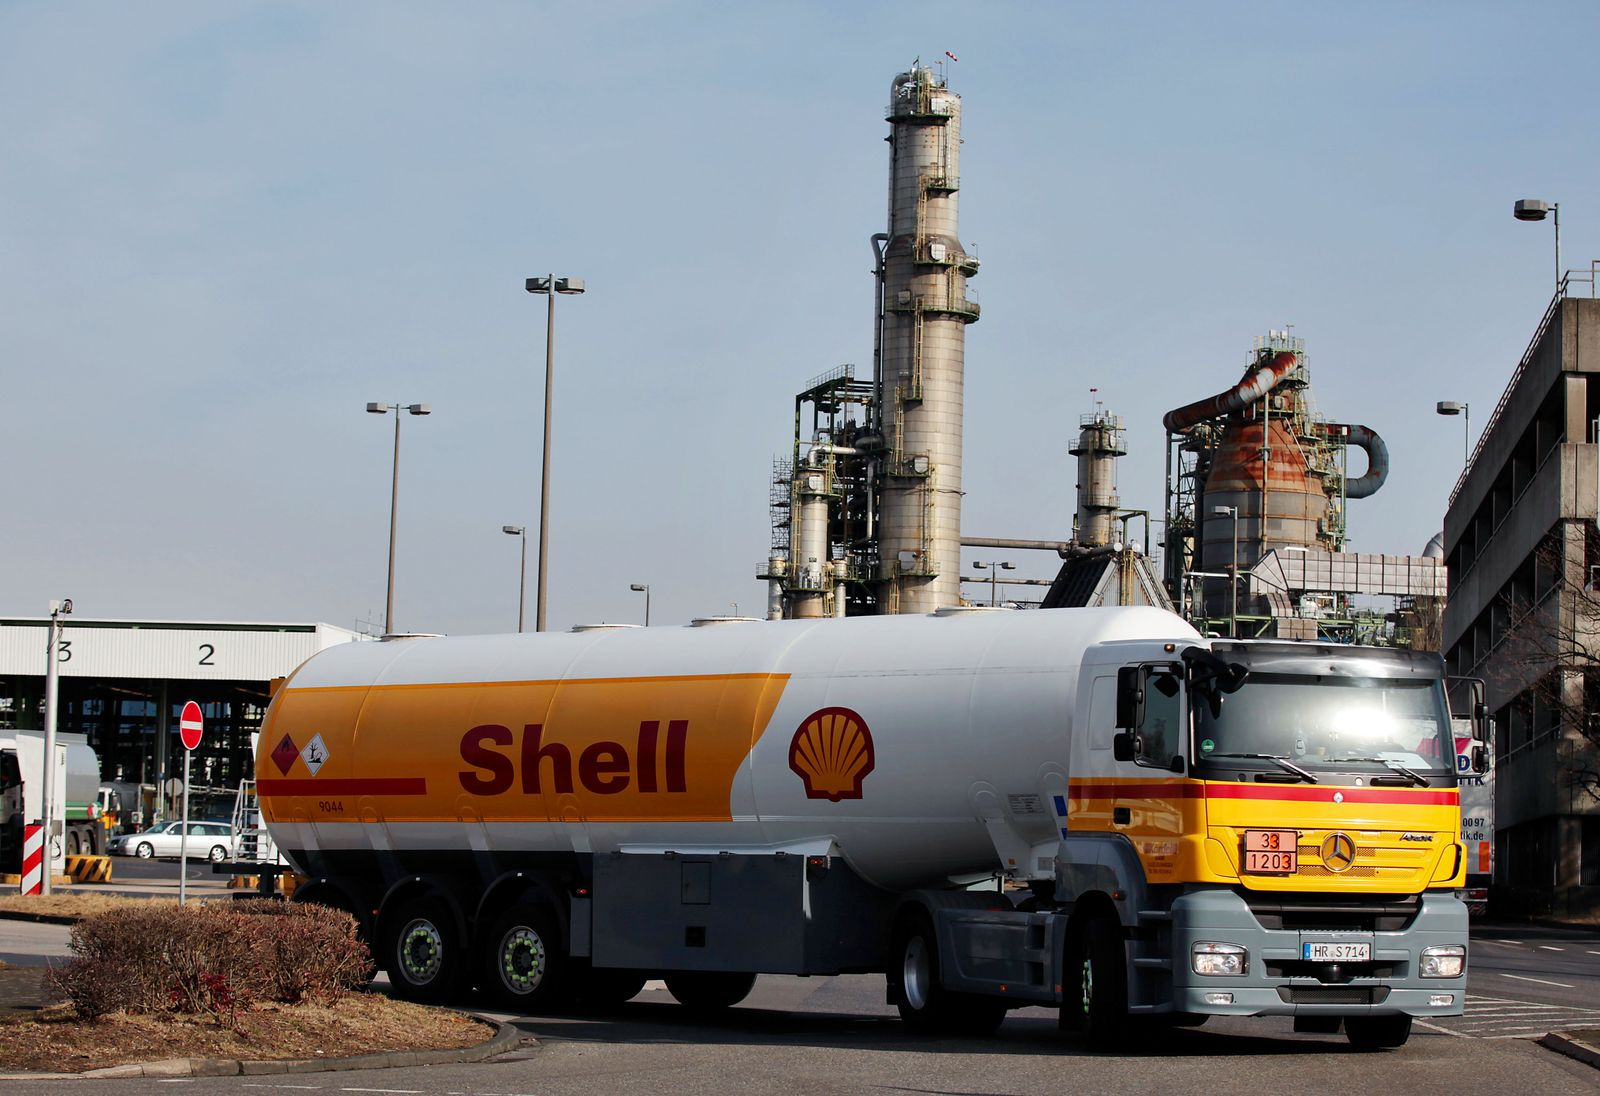 Shell / Benzin / Raffinerie